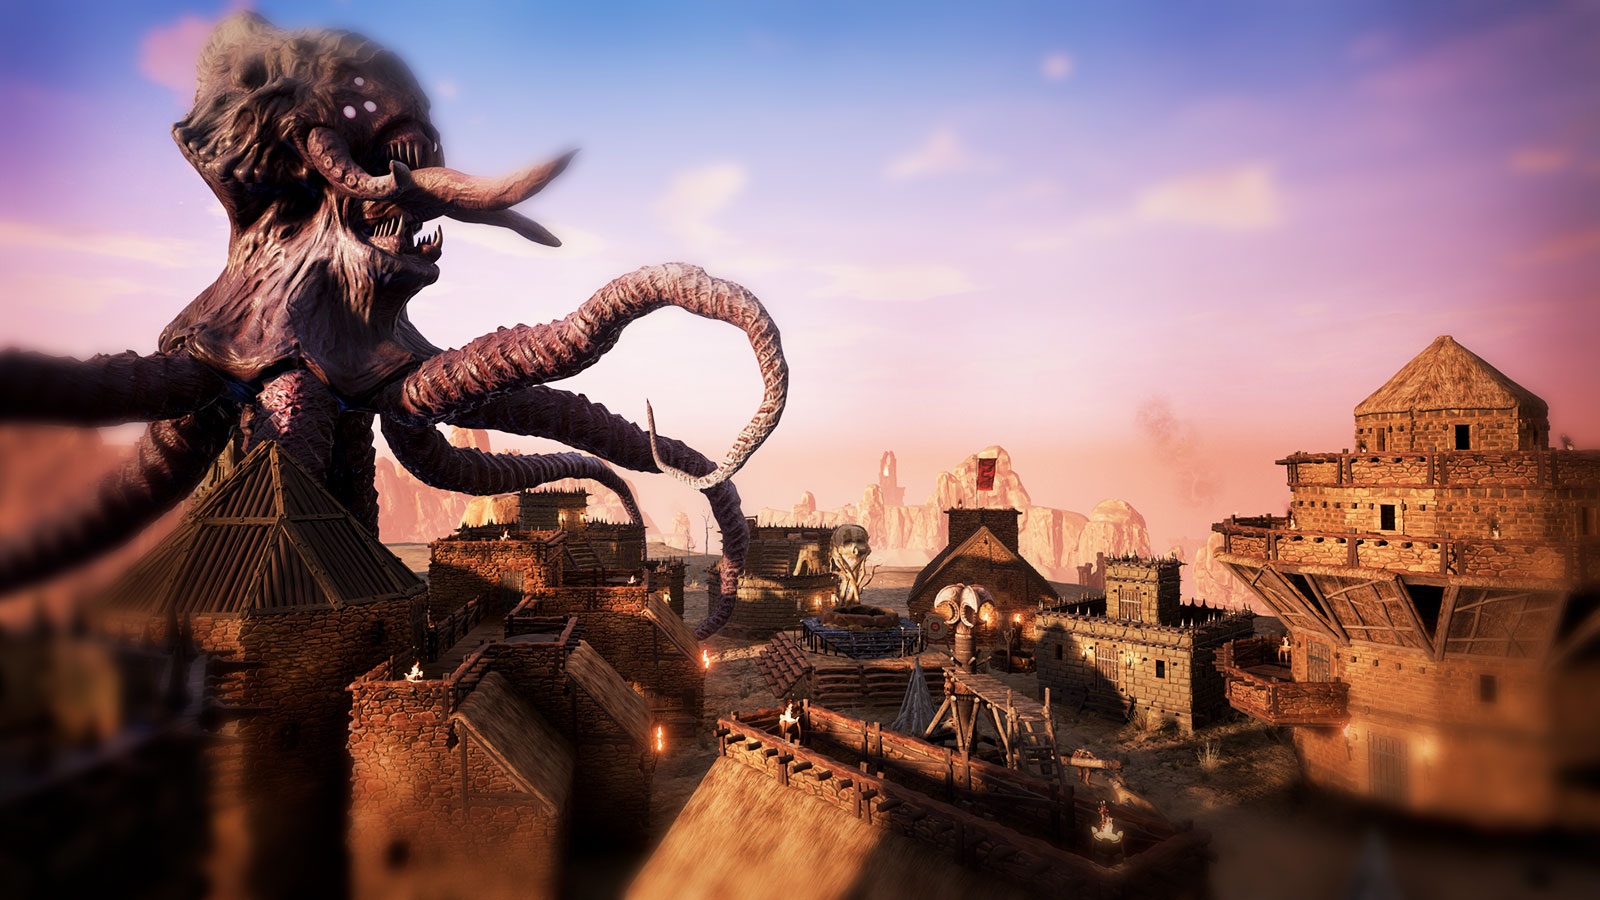 Conan Exiles строительство и песочница